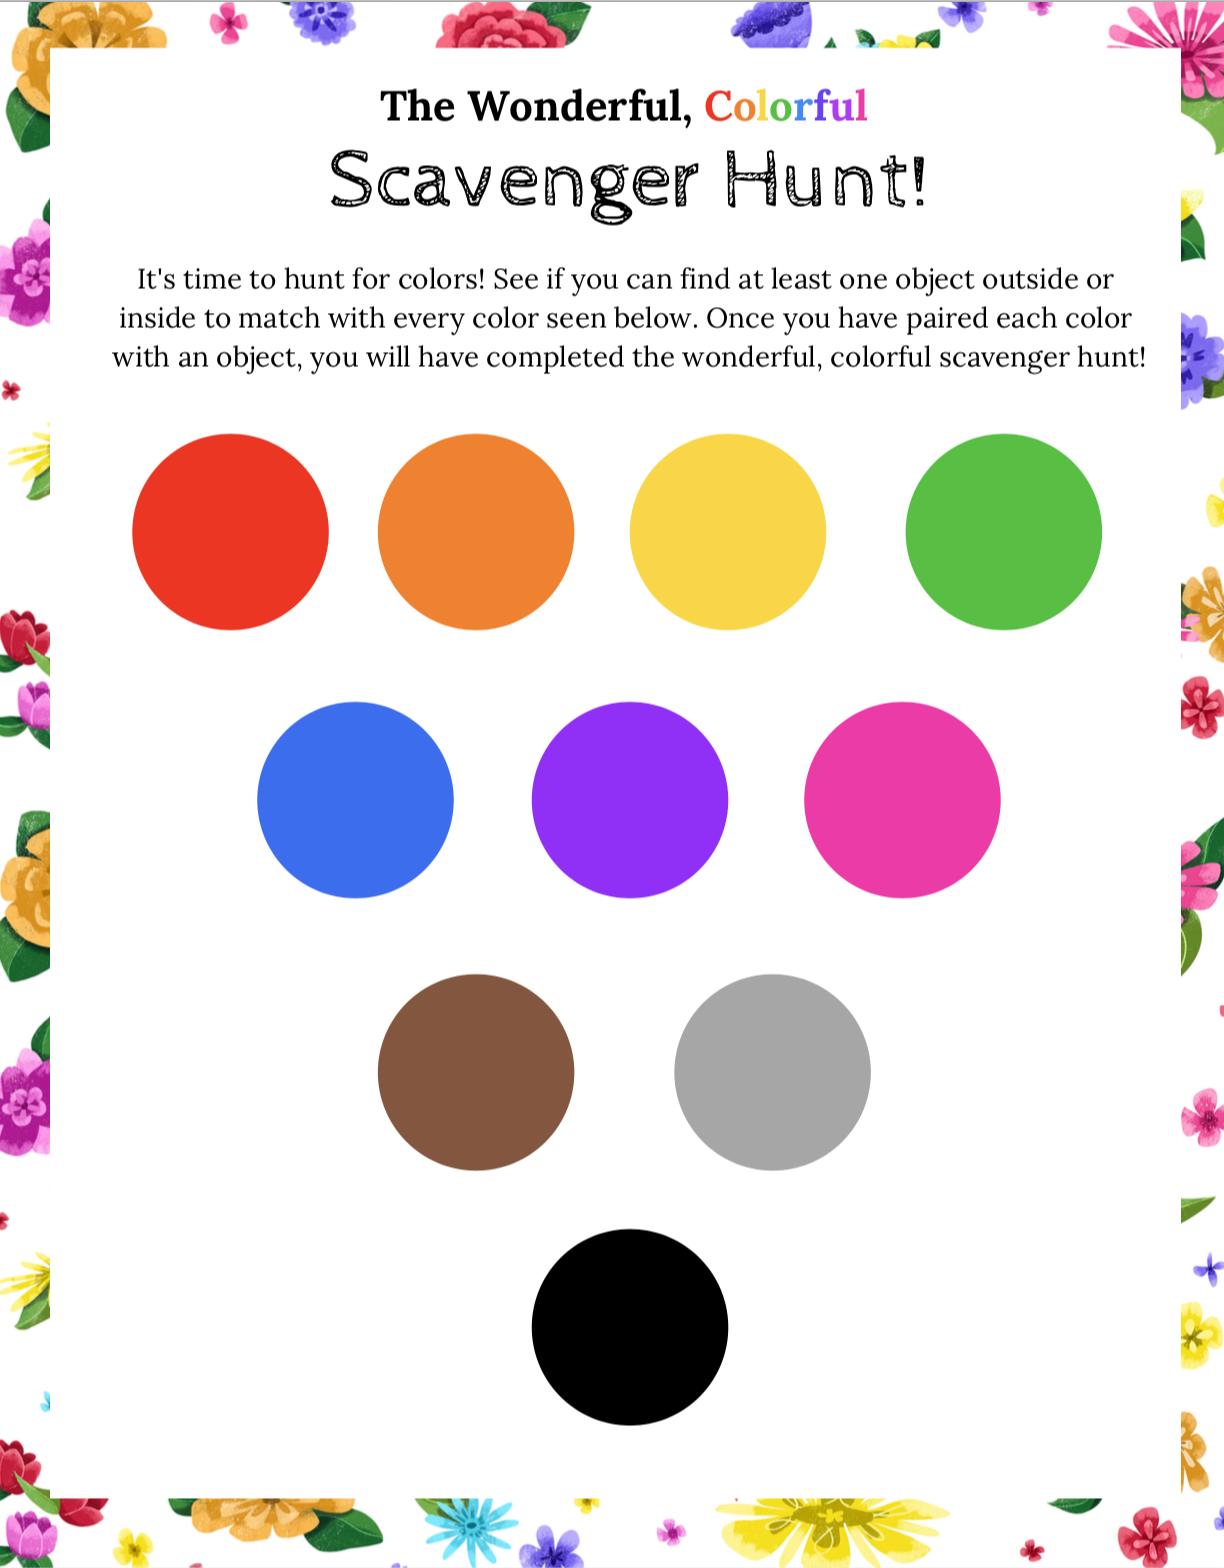 The Wonderful, Color Scavenger Hunt - The Blossom Shoppe